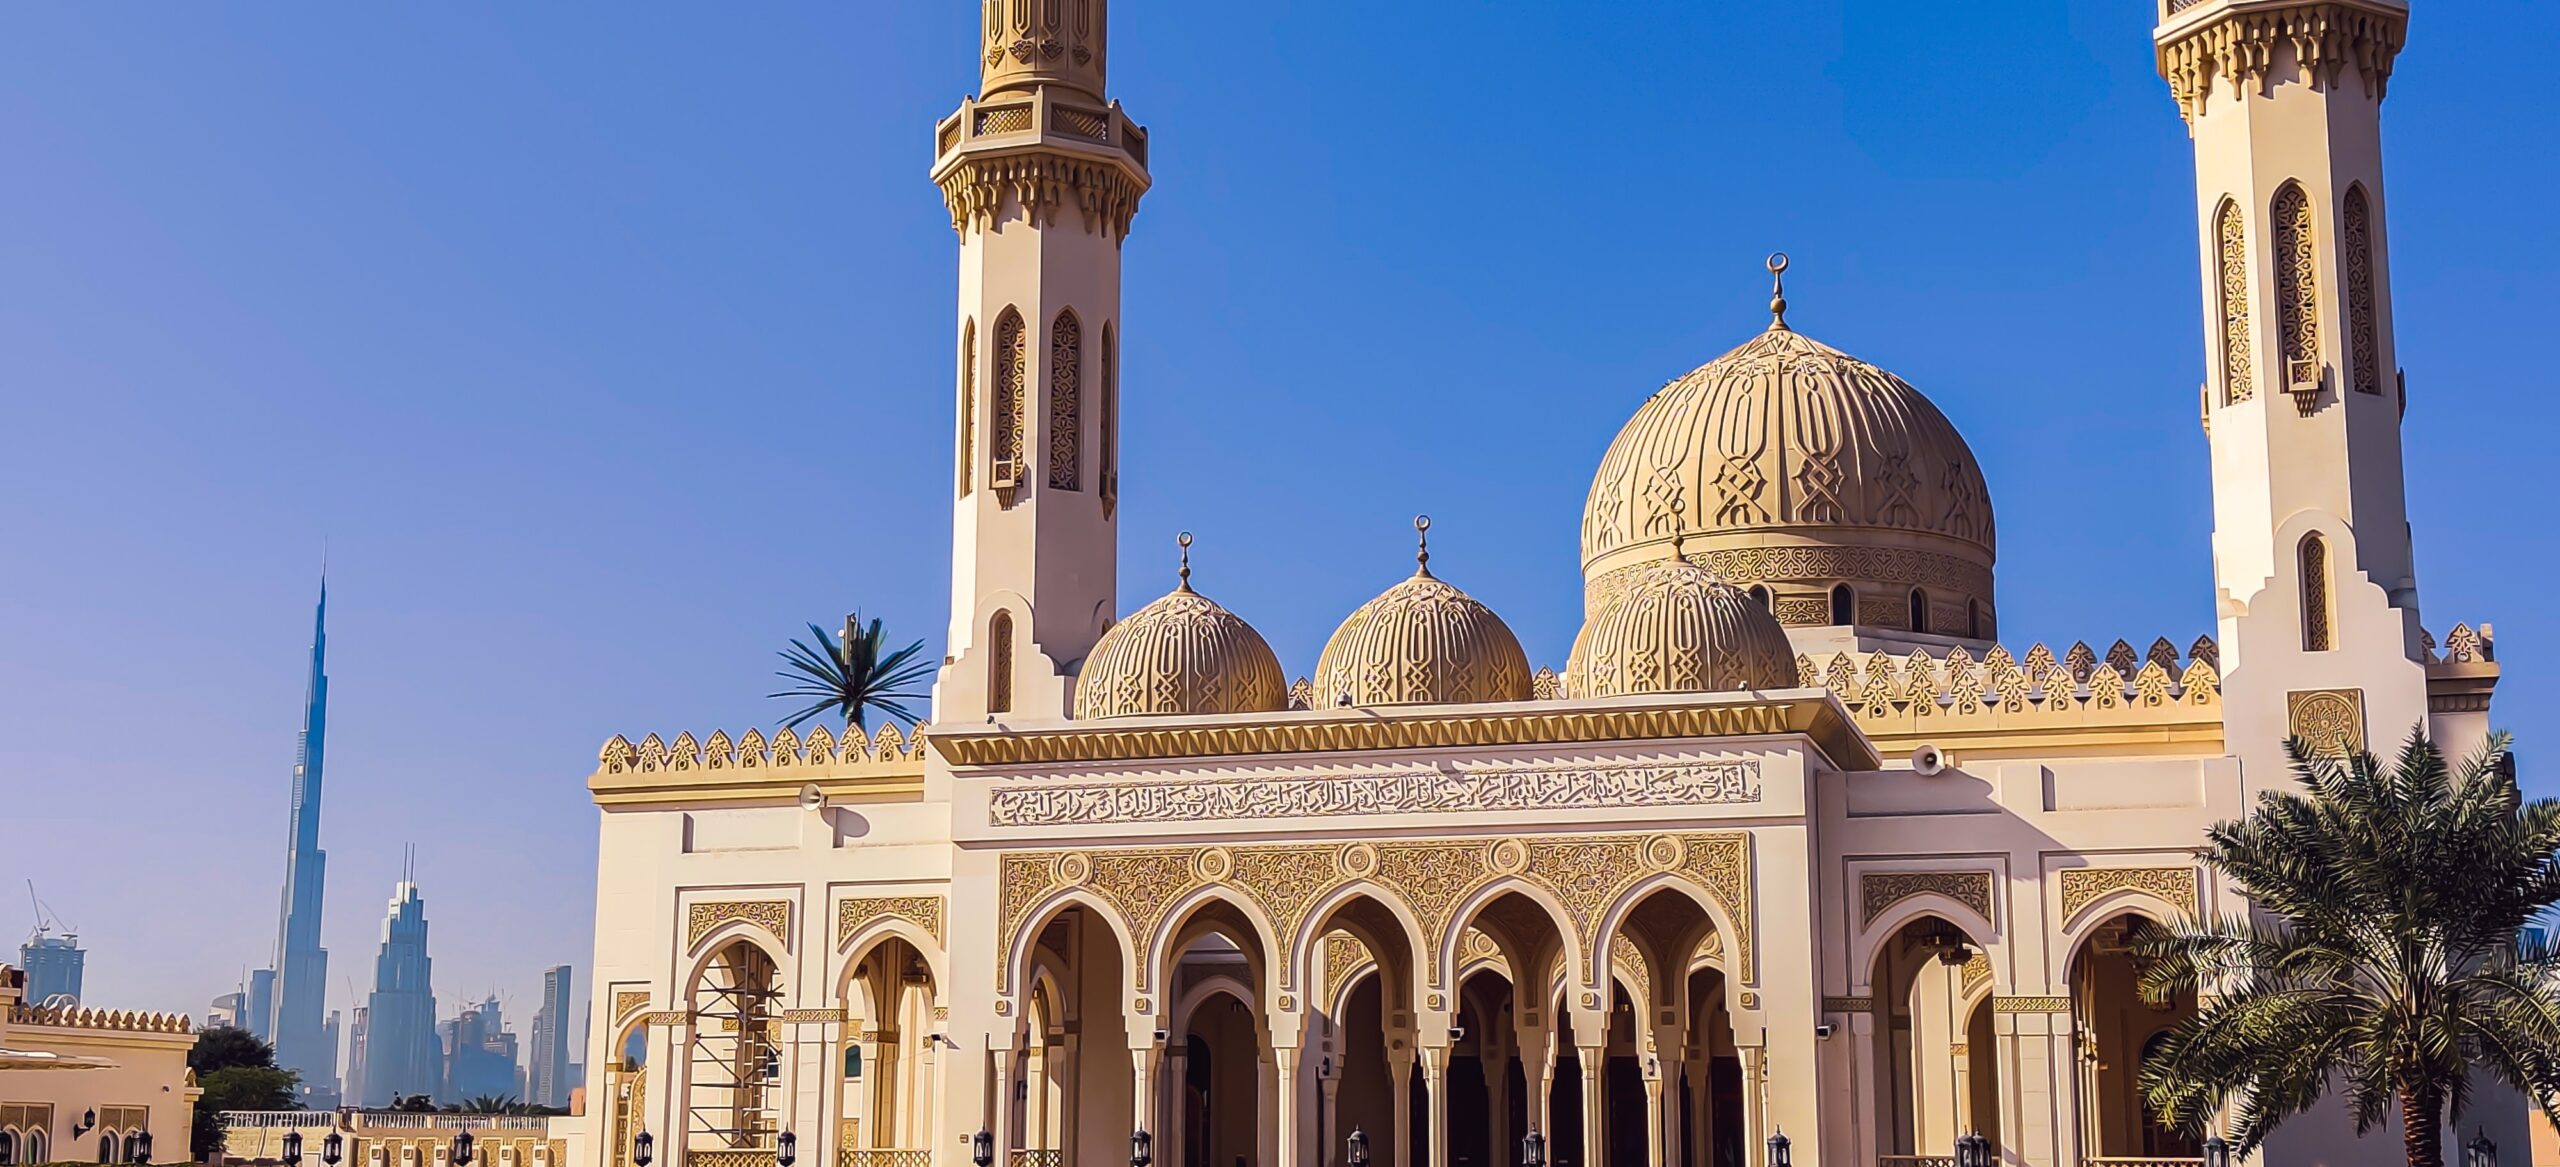 Jumeirah Mosque On Our Visit Dubai On Our Classic Dubai Half Day Tour